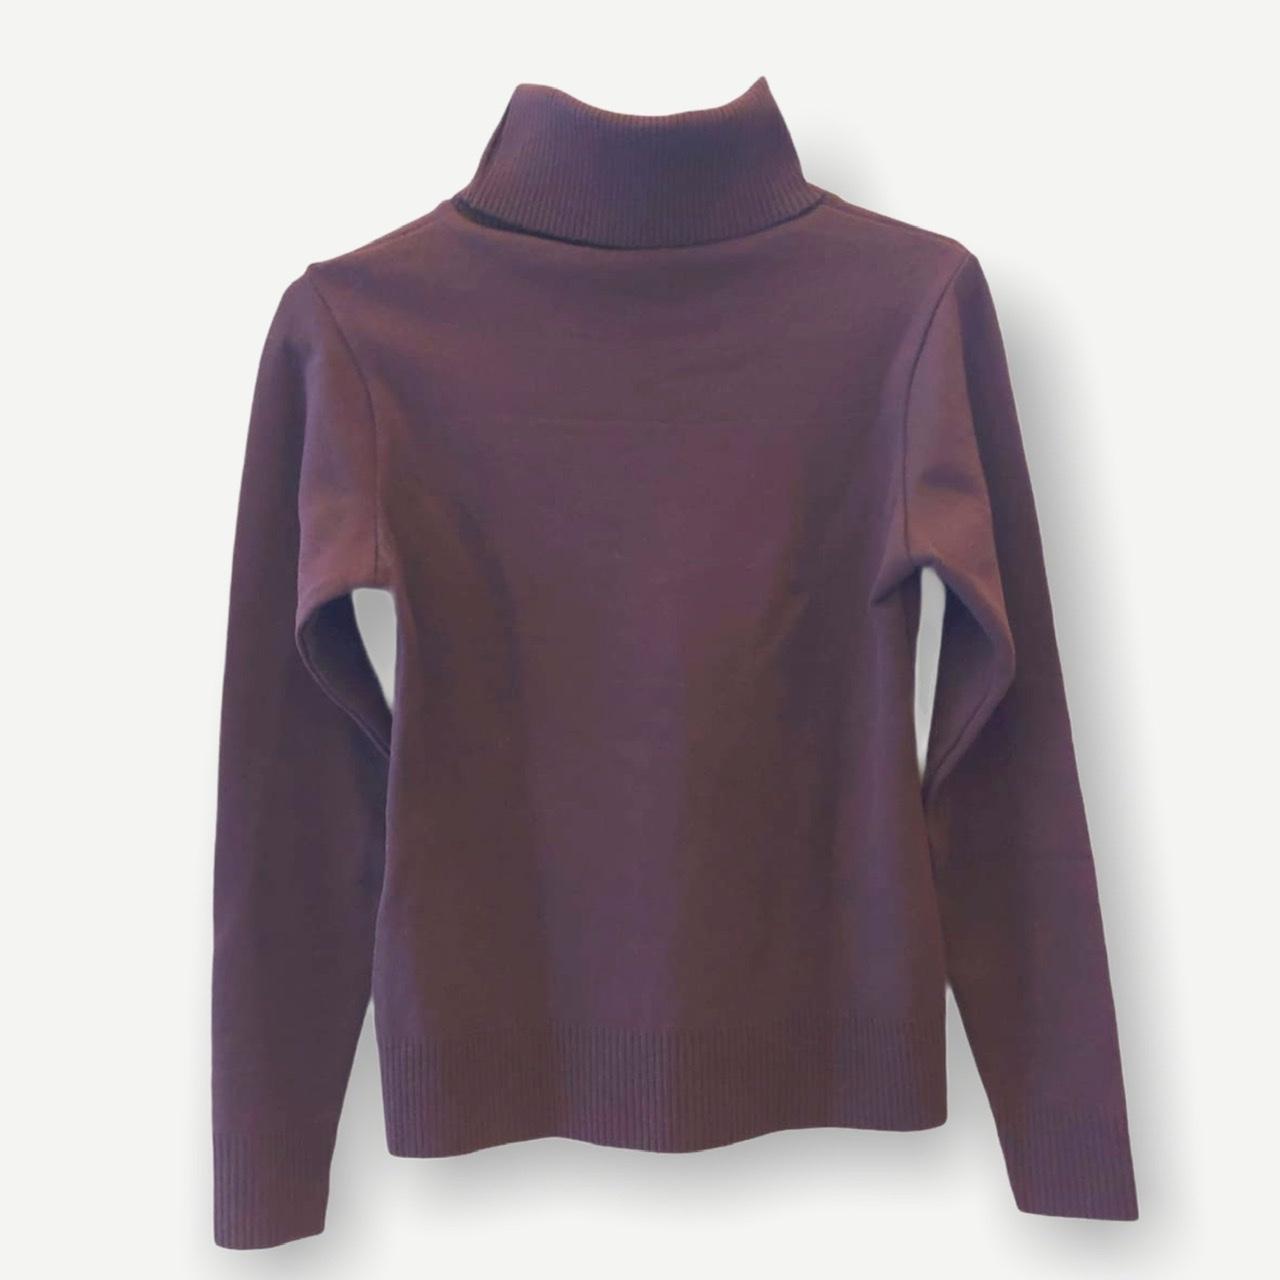 Blusa gola rolê marrom tricot  - Vivian Bógus